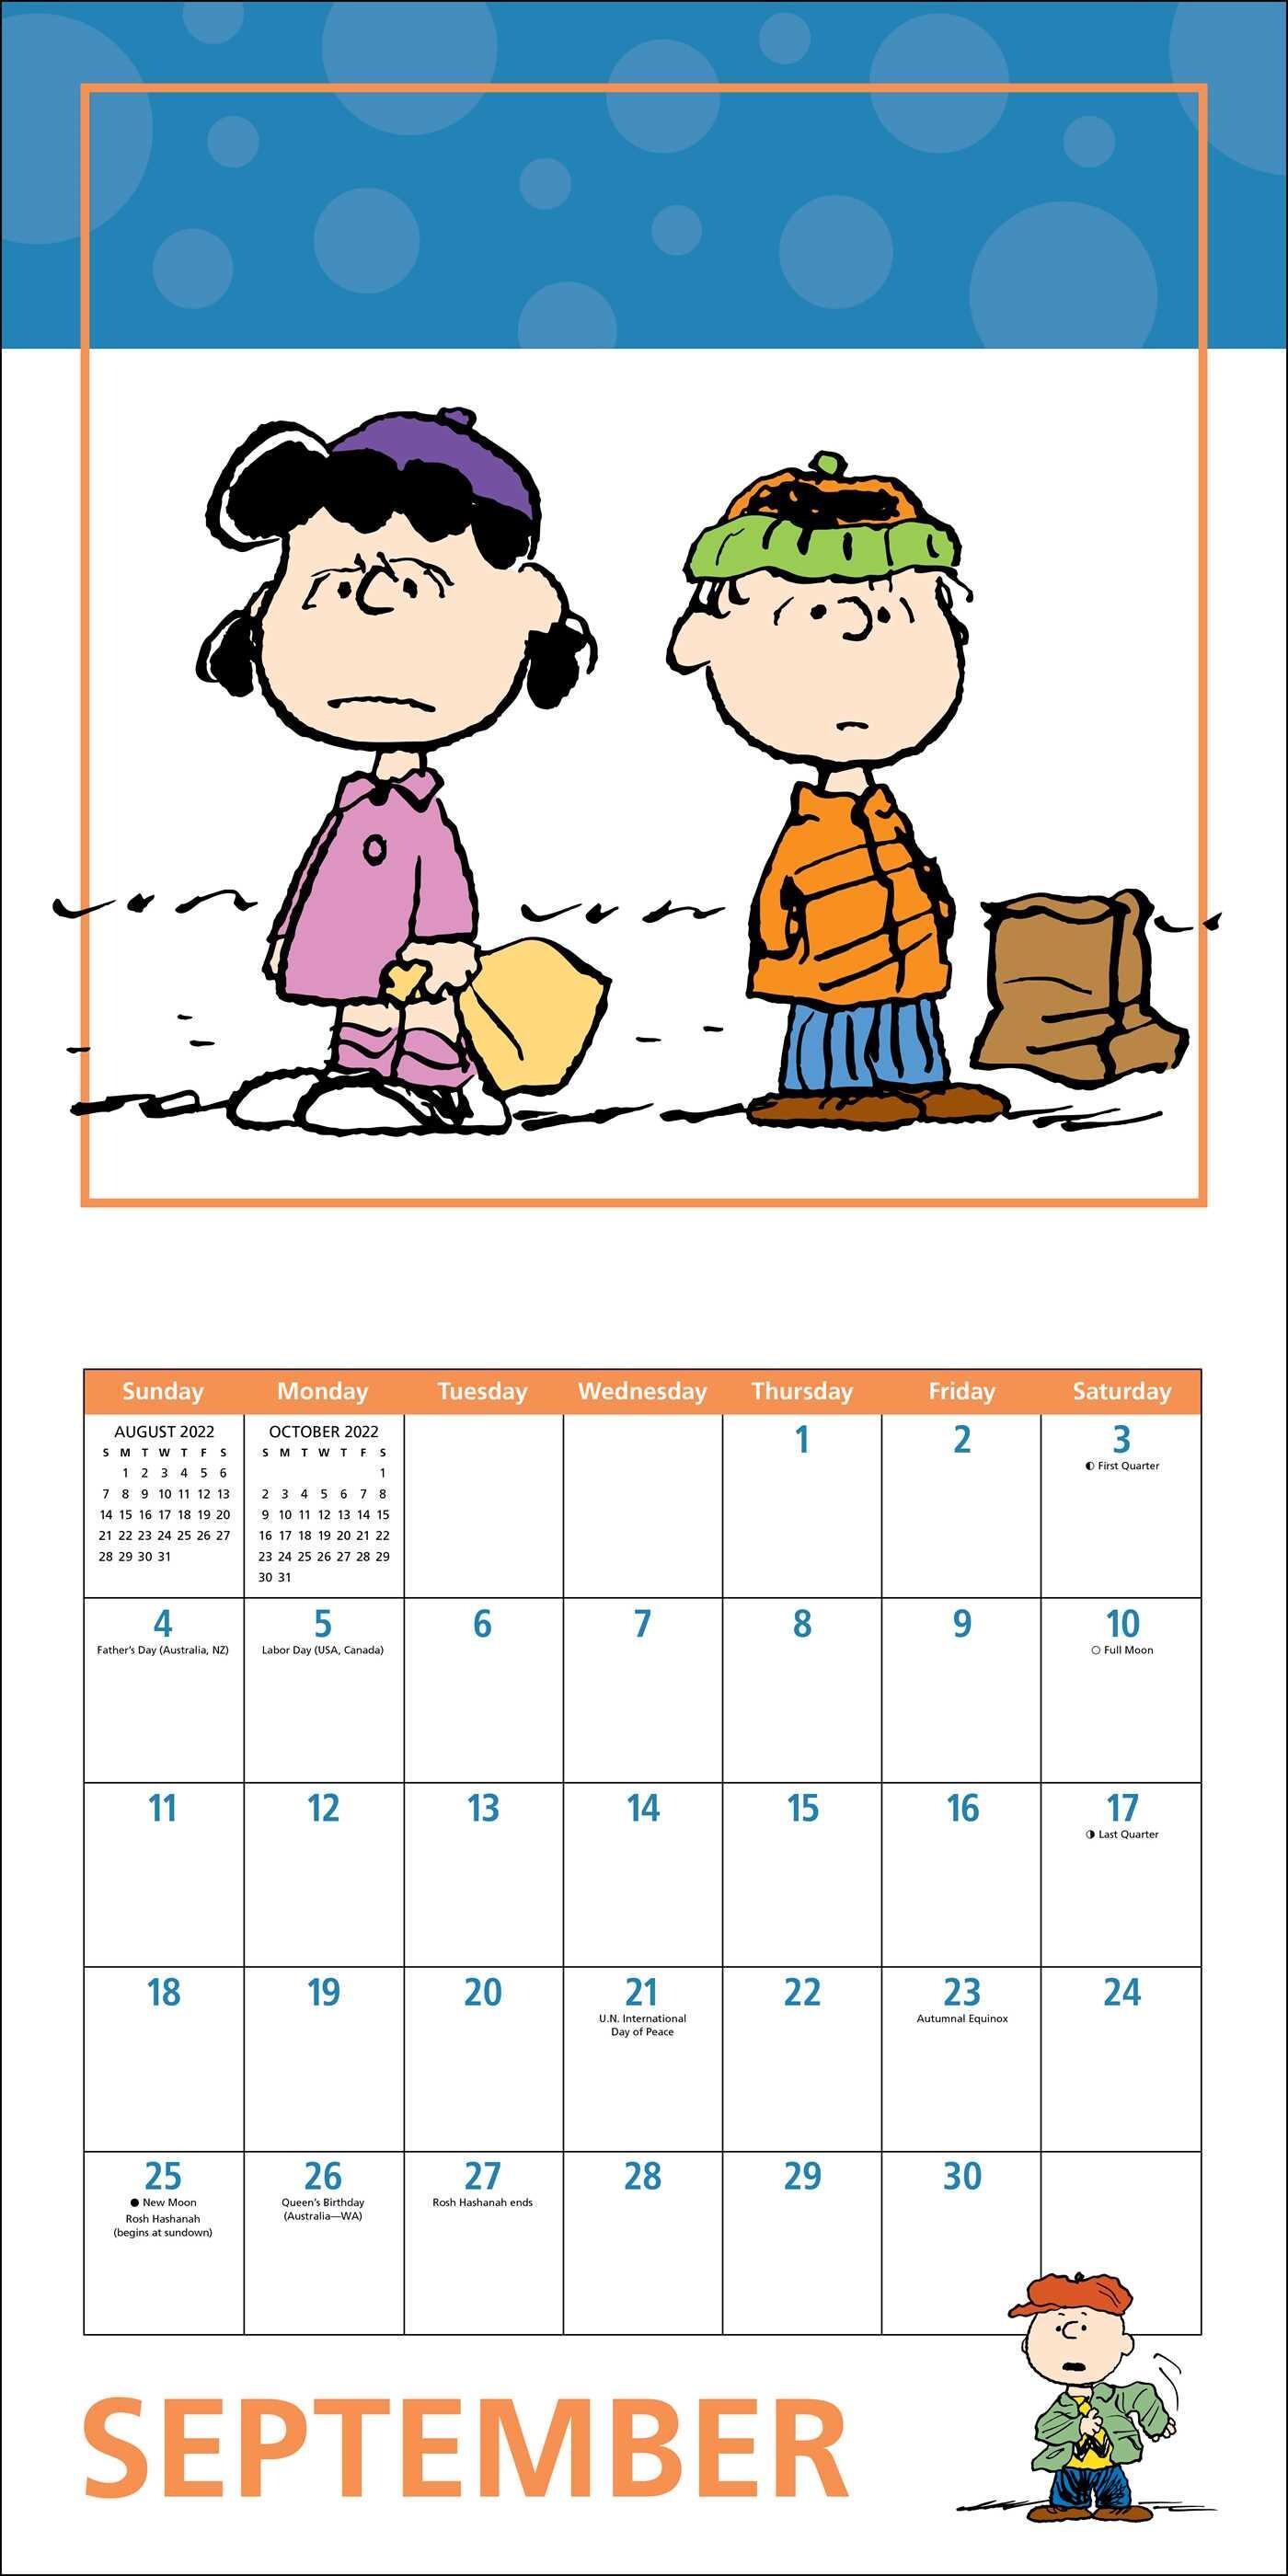 Uofa Calendar 2022.Peanuts 2022 Wall Calendar Book Summary Video Official Publisher Page Simon Schuster Canada